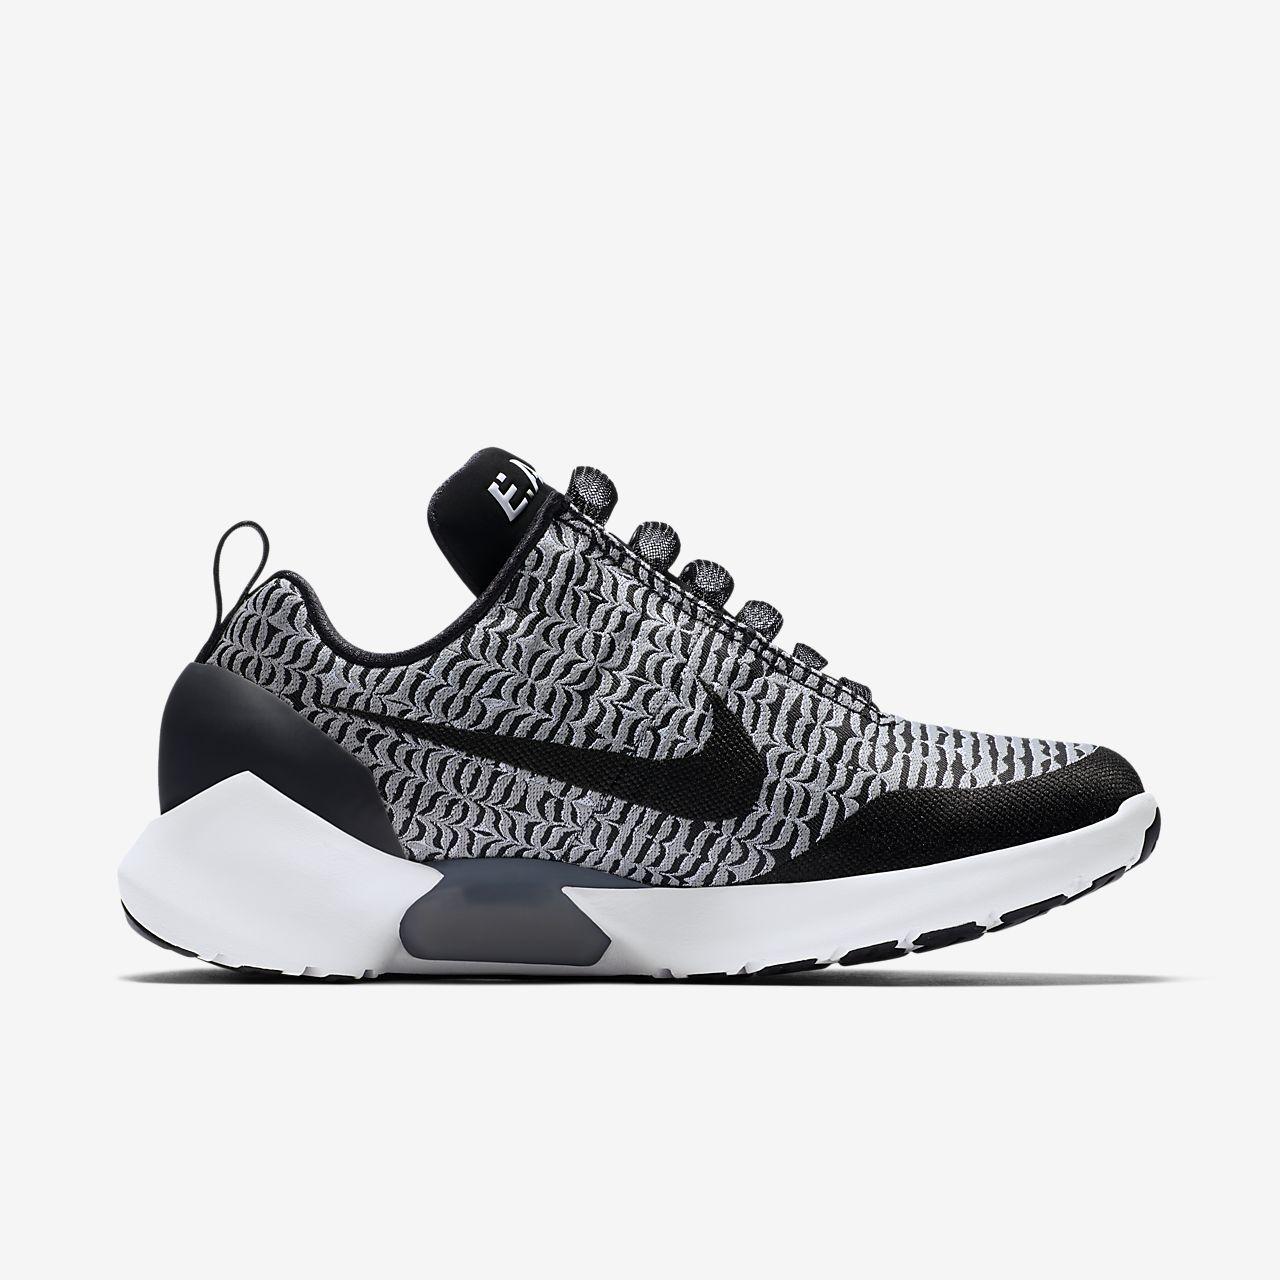 Nike HyperAdapt 1.0 Zapatillas (toma inglesa) Hombre